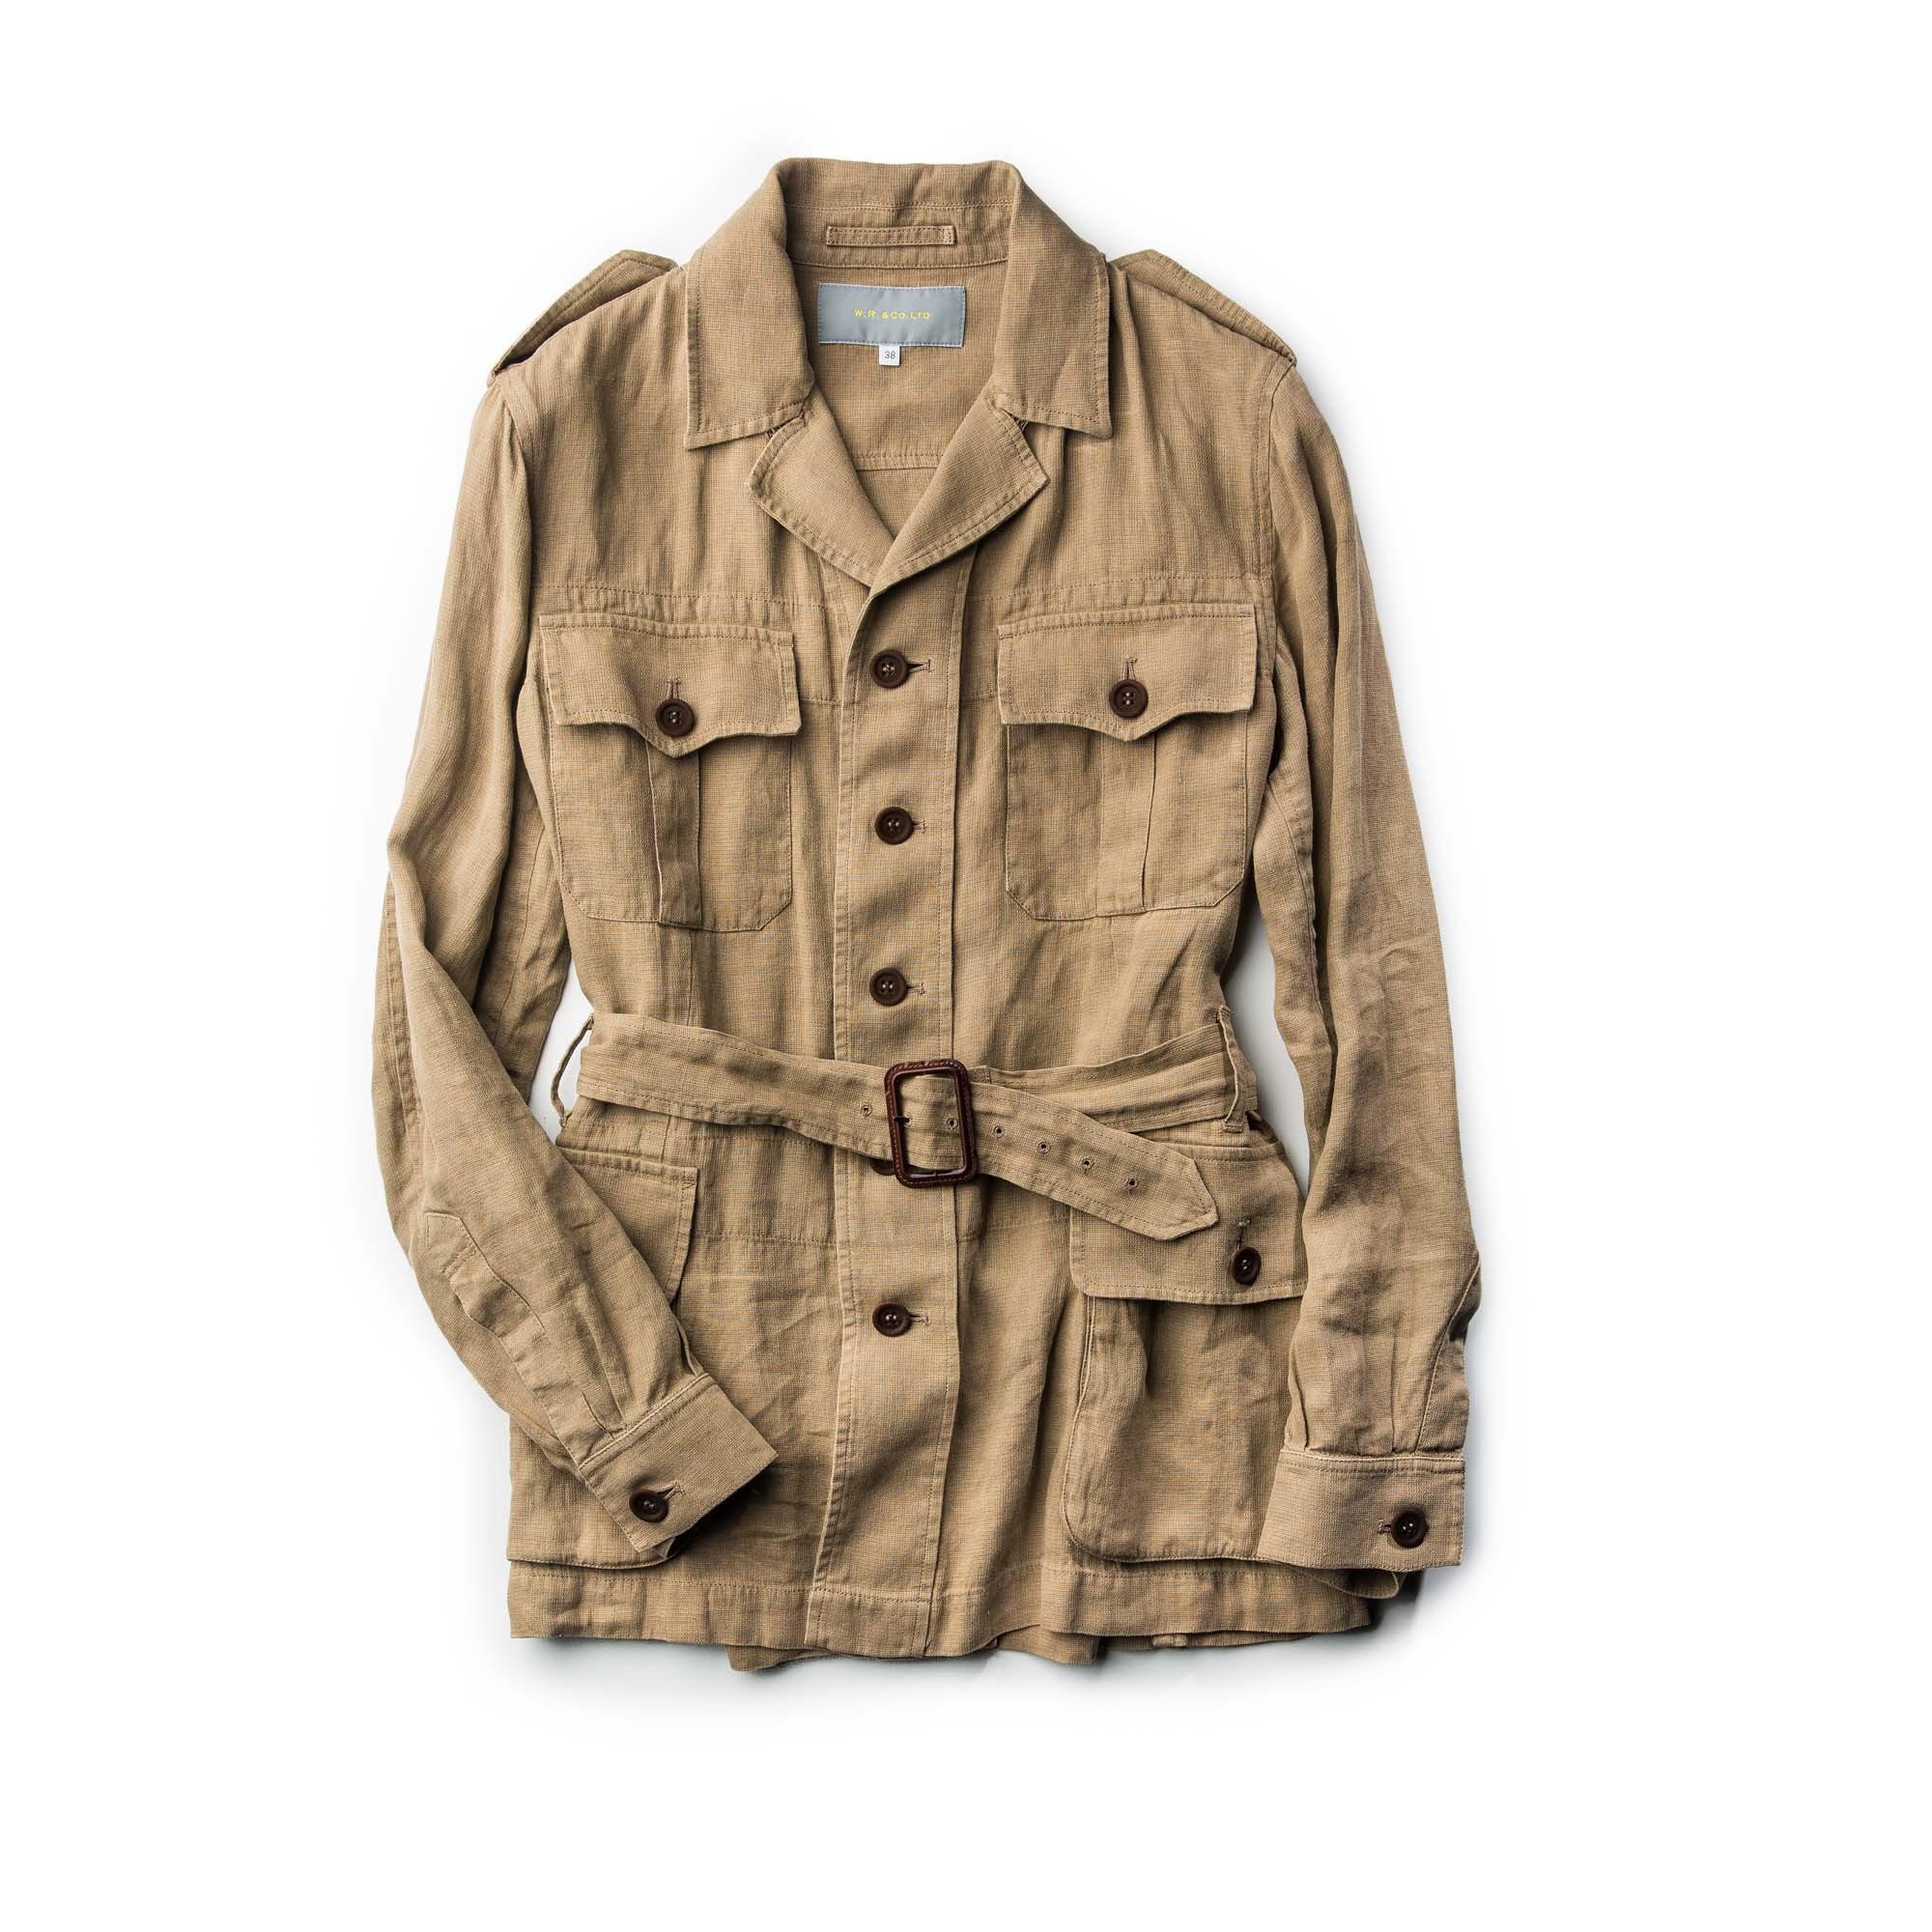 Where Is The Co U R: W. R. & Co. Safari Jacket - Beige